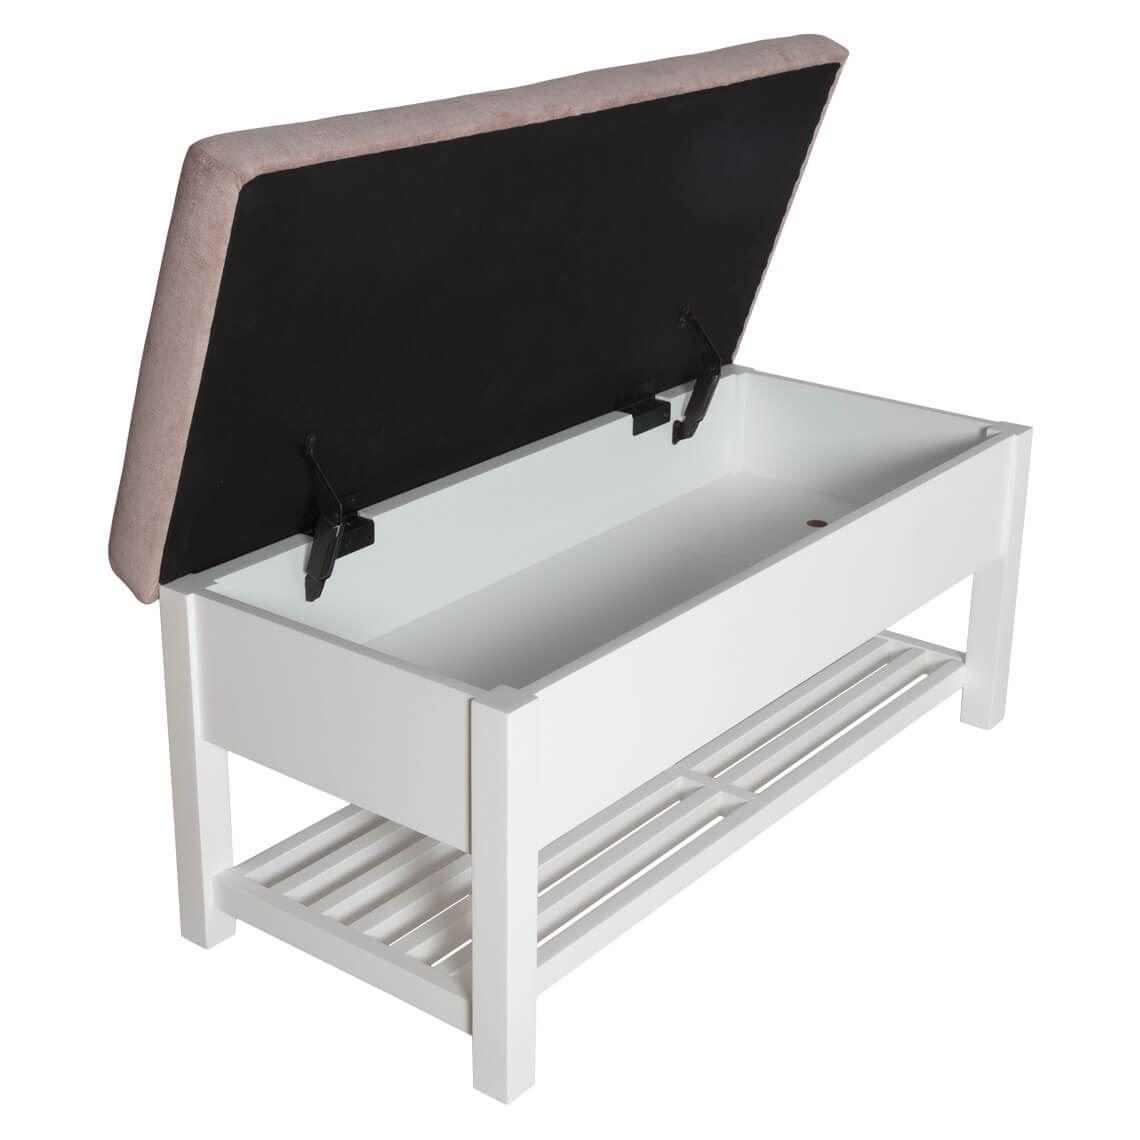 Superb Freedom Bobbie Storage Bench Size W 100Cm X D 45Cm X H 46Cm Inzonedesignstudio Interior Chair Design Inzonedesignstudiocom